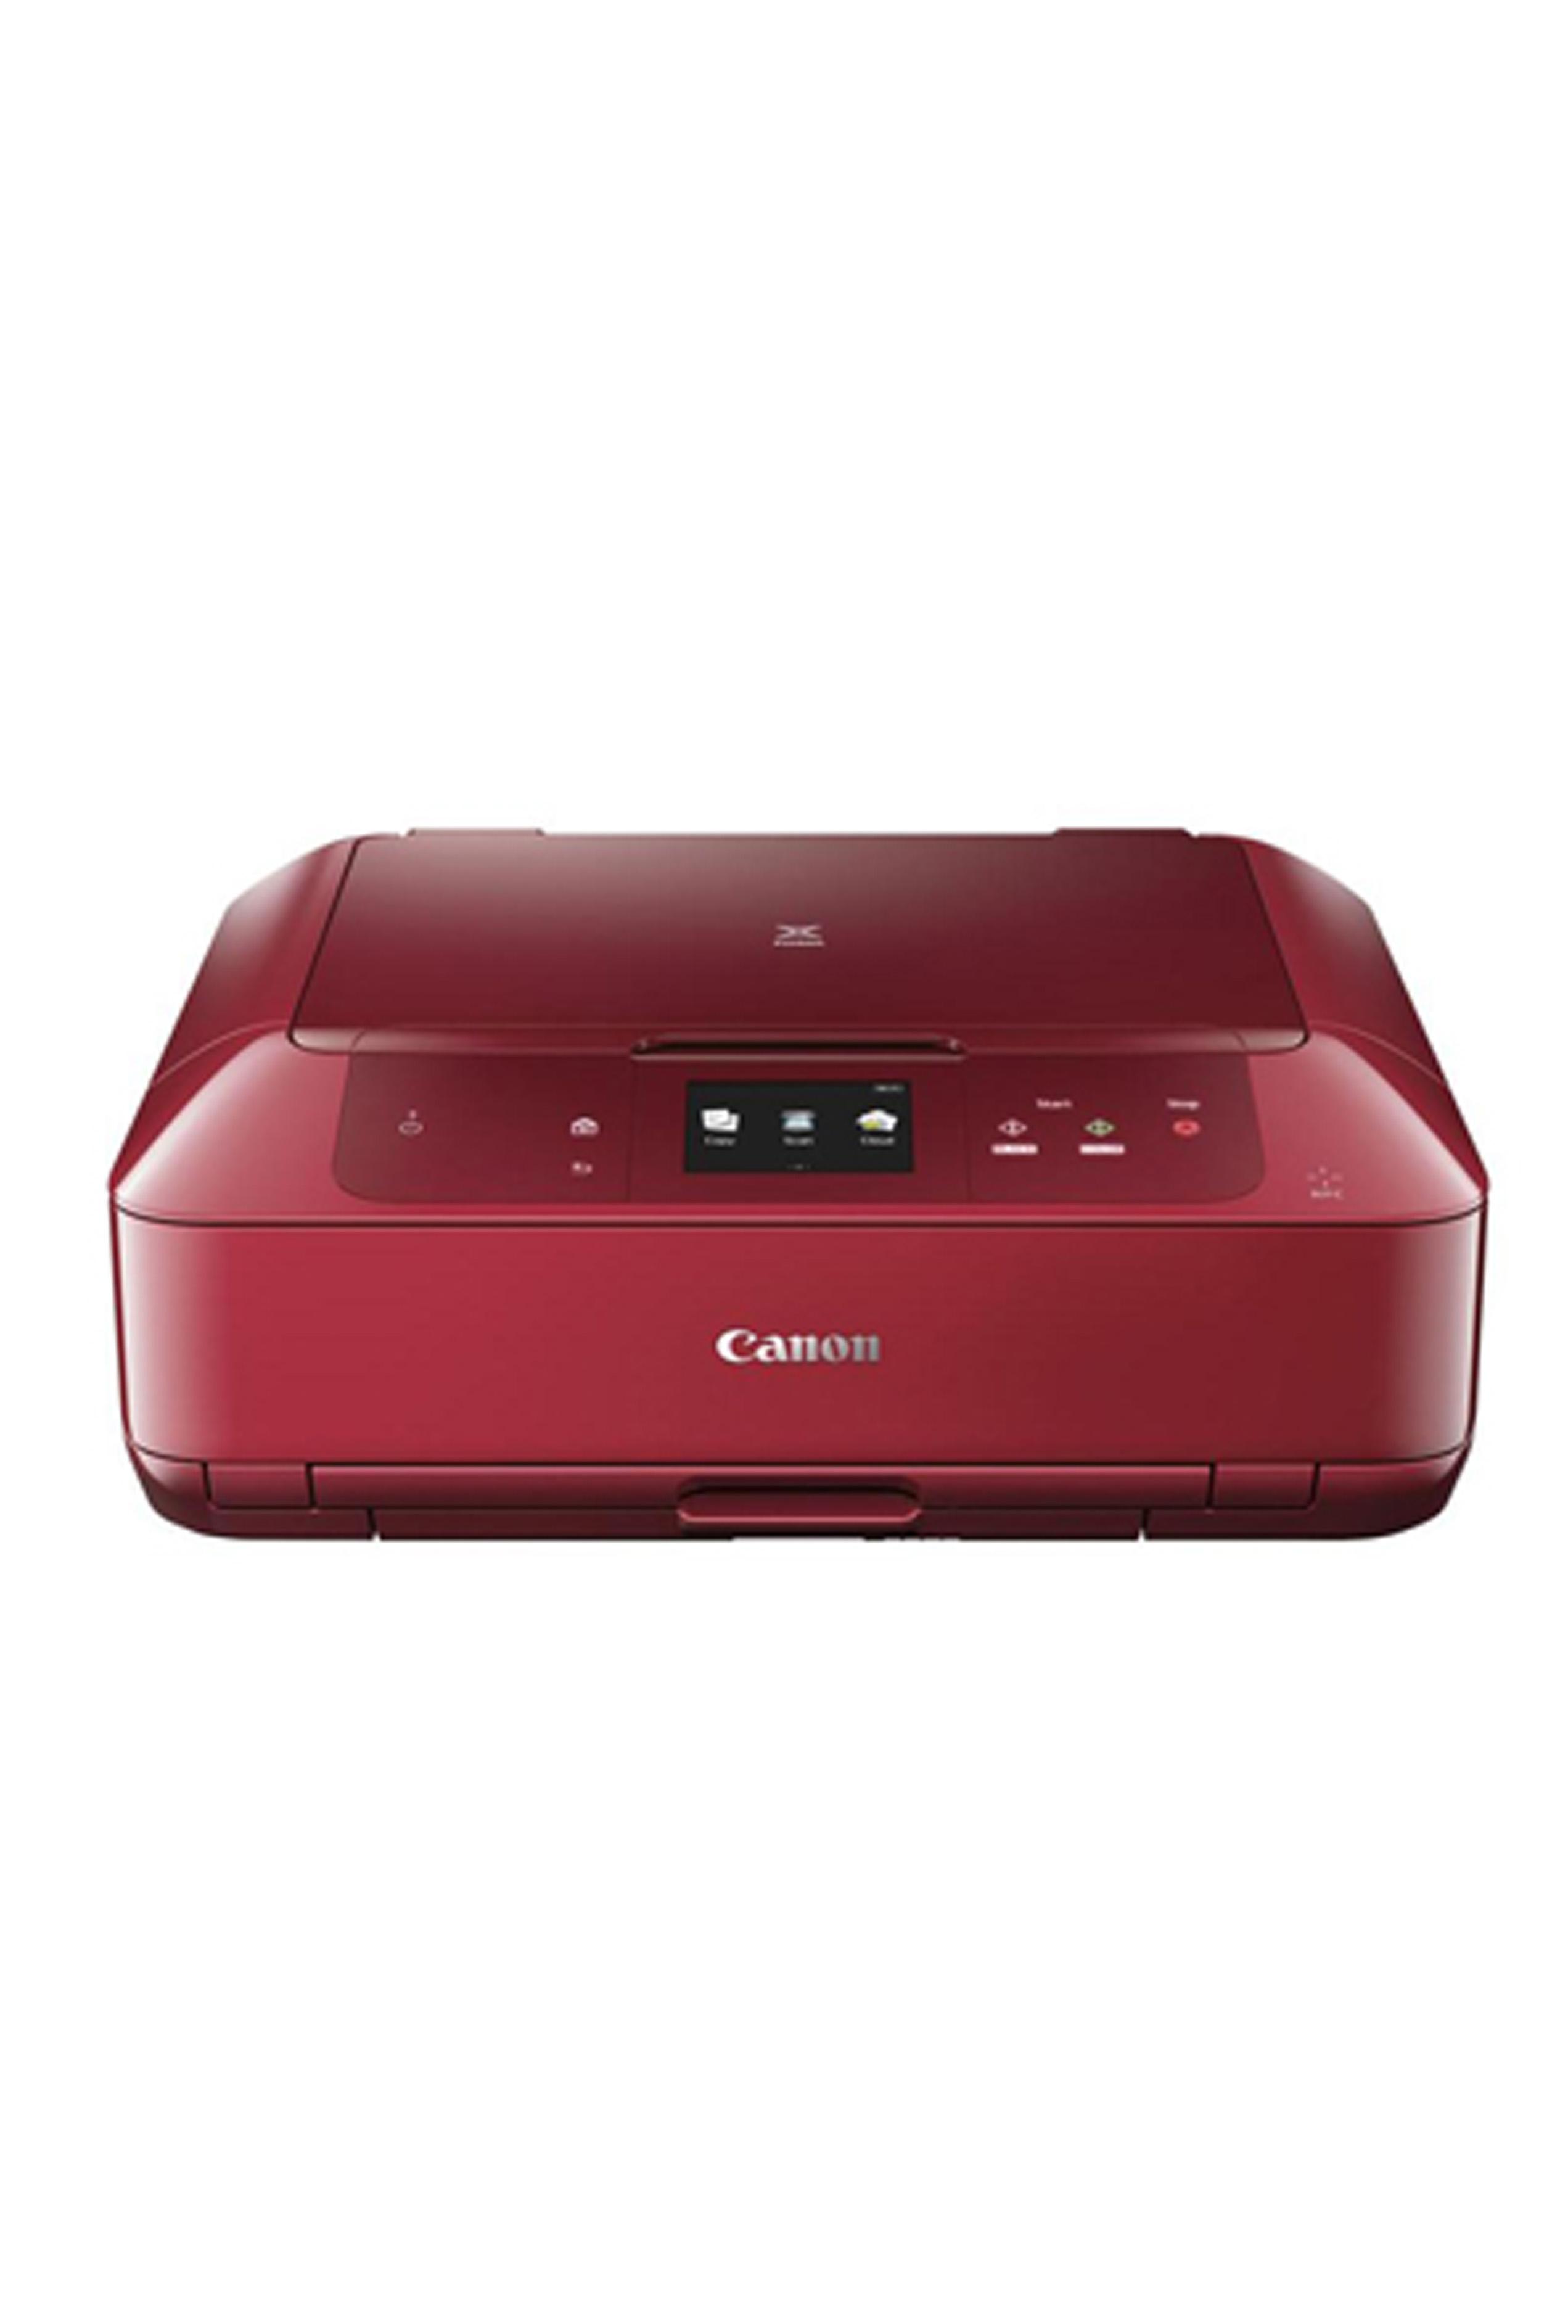 Canon PIXMA MG7720 Red (15ipm/10ipm)